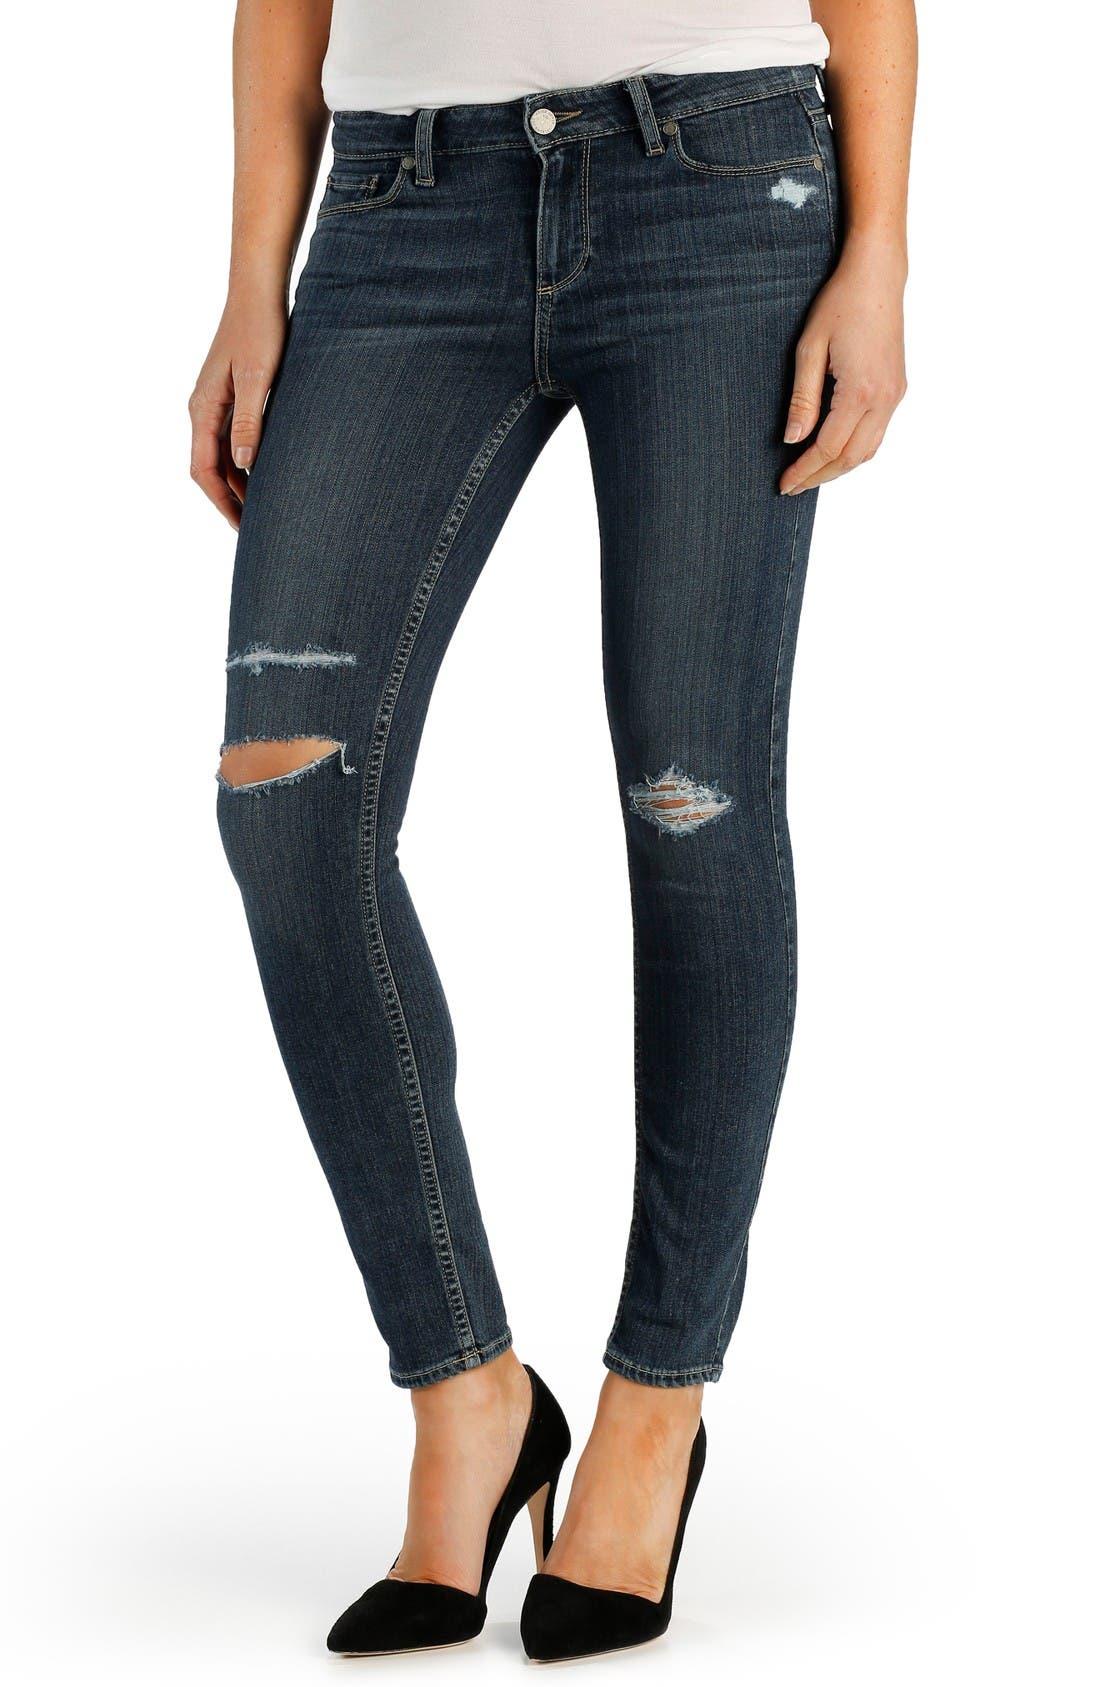 Alternate Image 1 Selected - PAIGE Transcend - Verdugo Ankle Ultra Skinny Jeans (Adira Destructed)